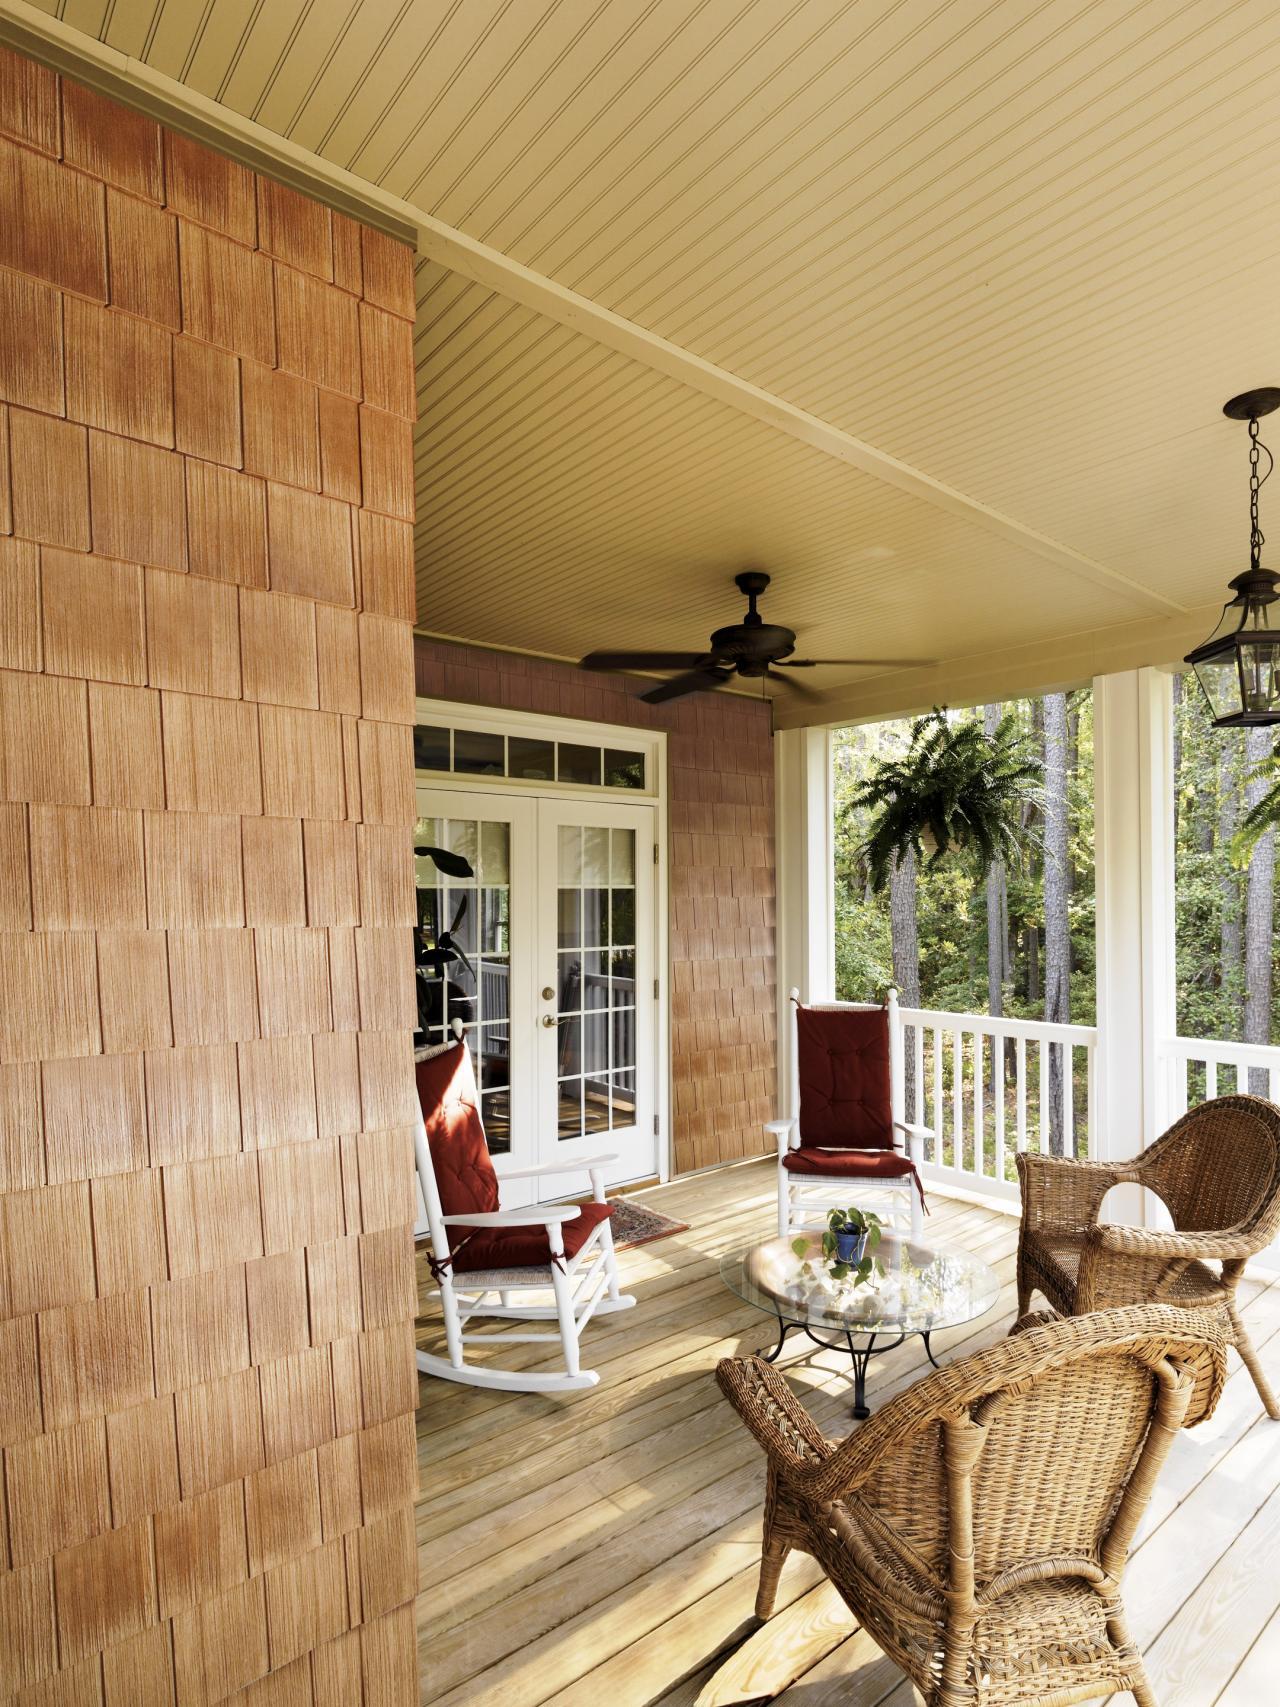 Exterior: Buyer's Guide For Exterior Siding